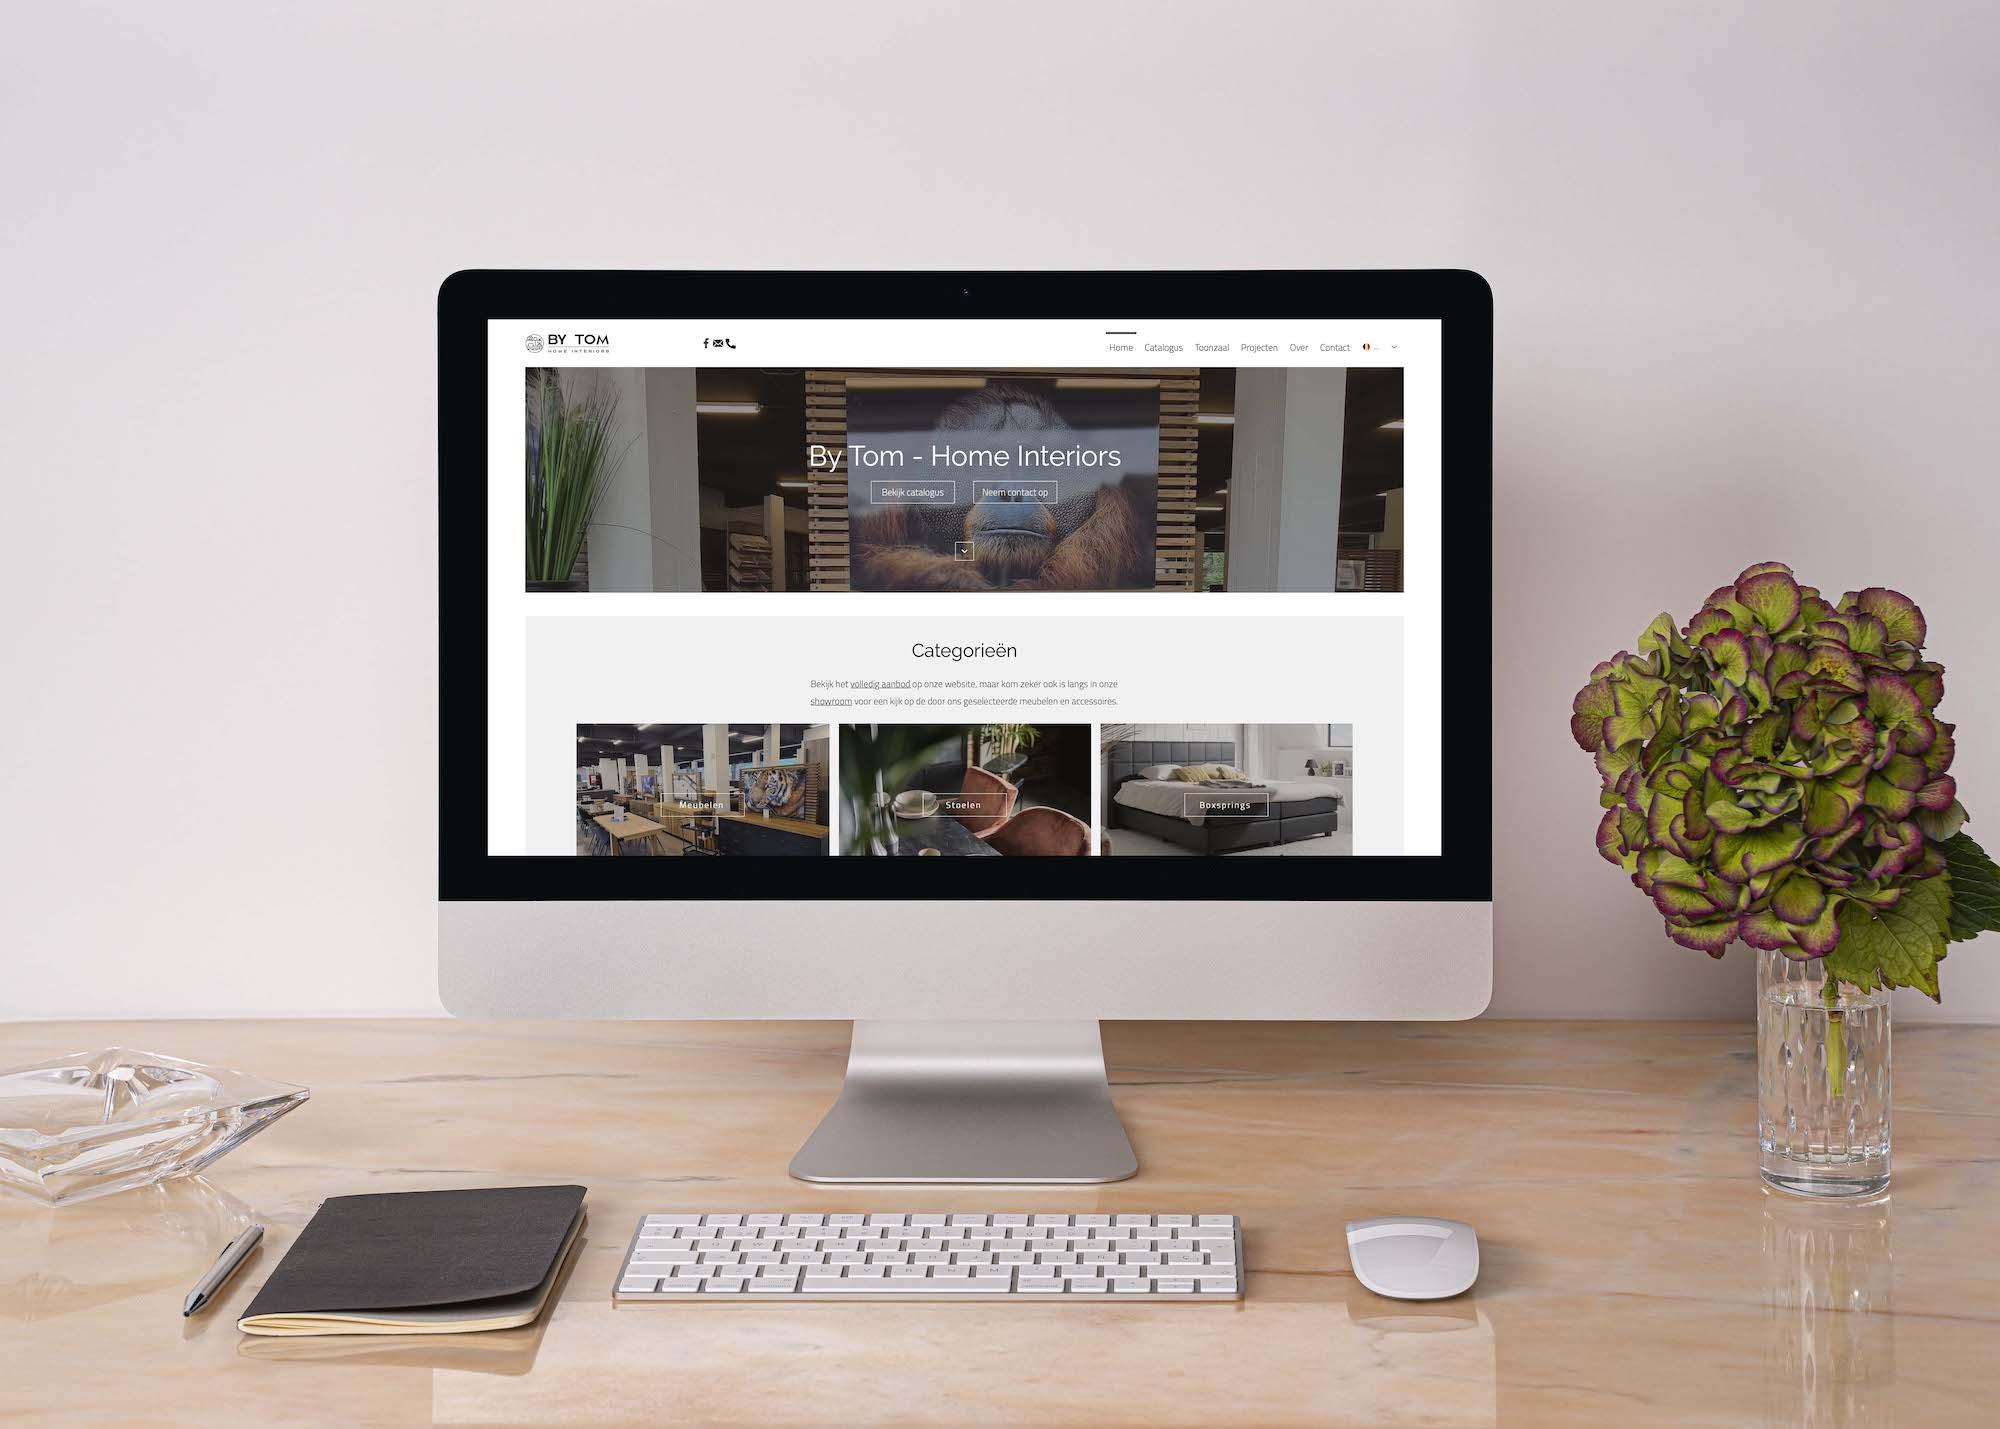 By Tom - Home Interiors ➡️ Webdesign ➡️ Webshop ➡️ SEO ➡️ Meertalig